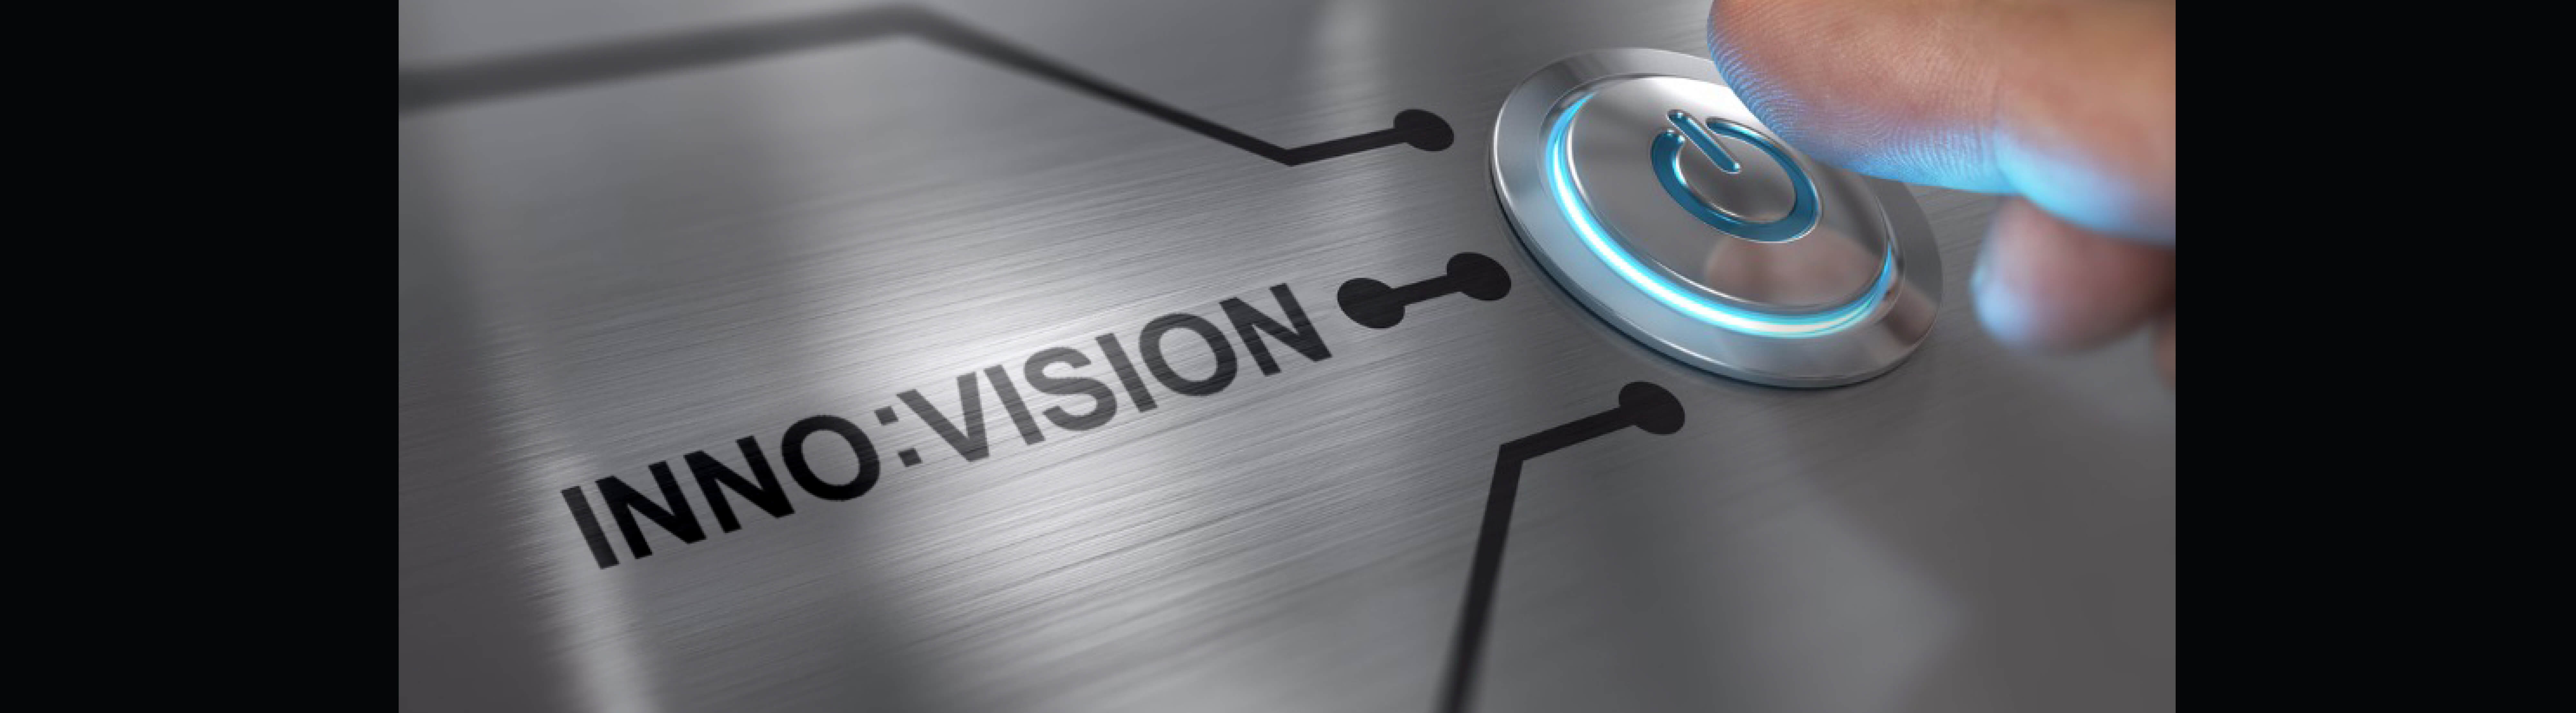 Inno:vision